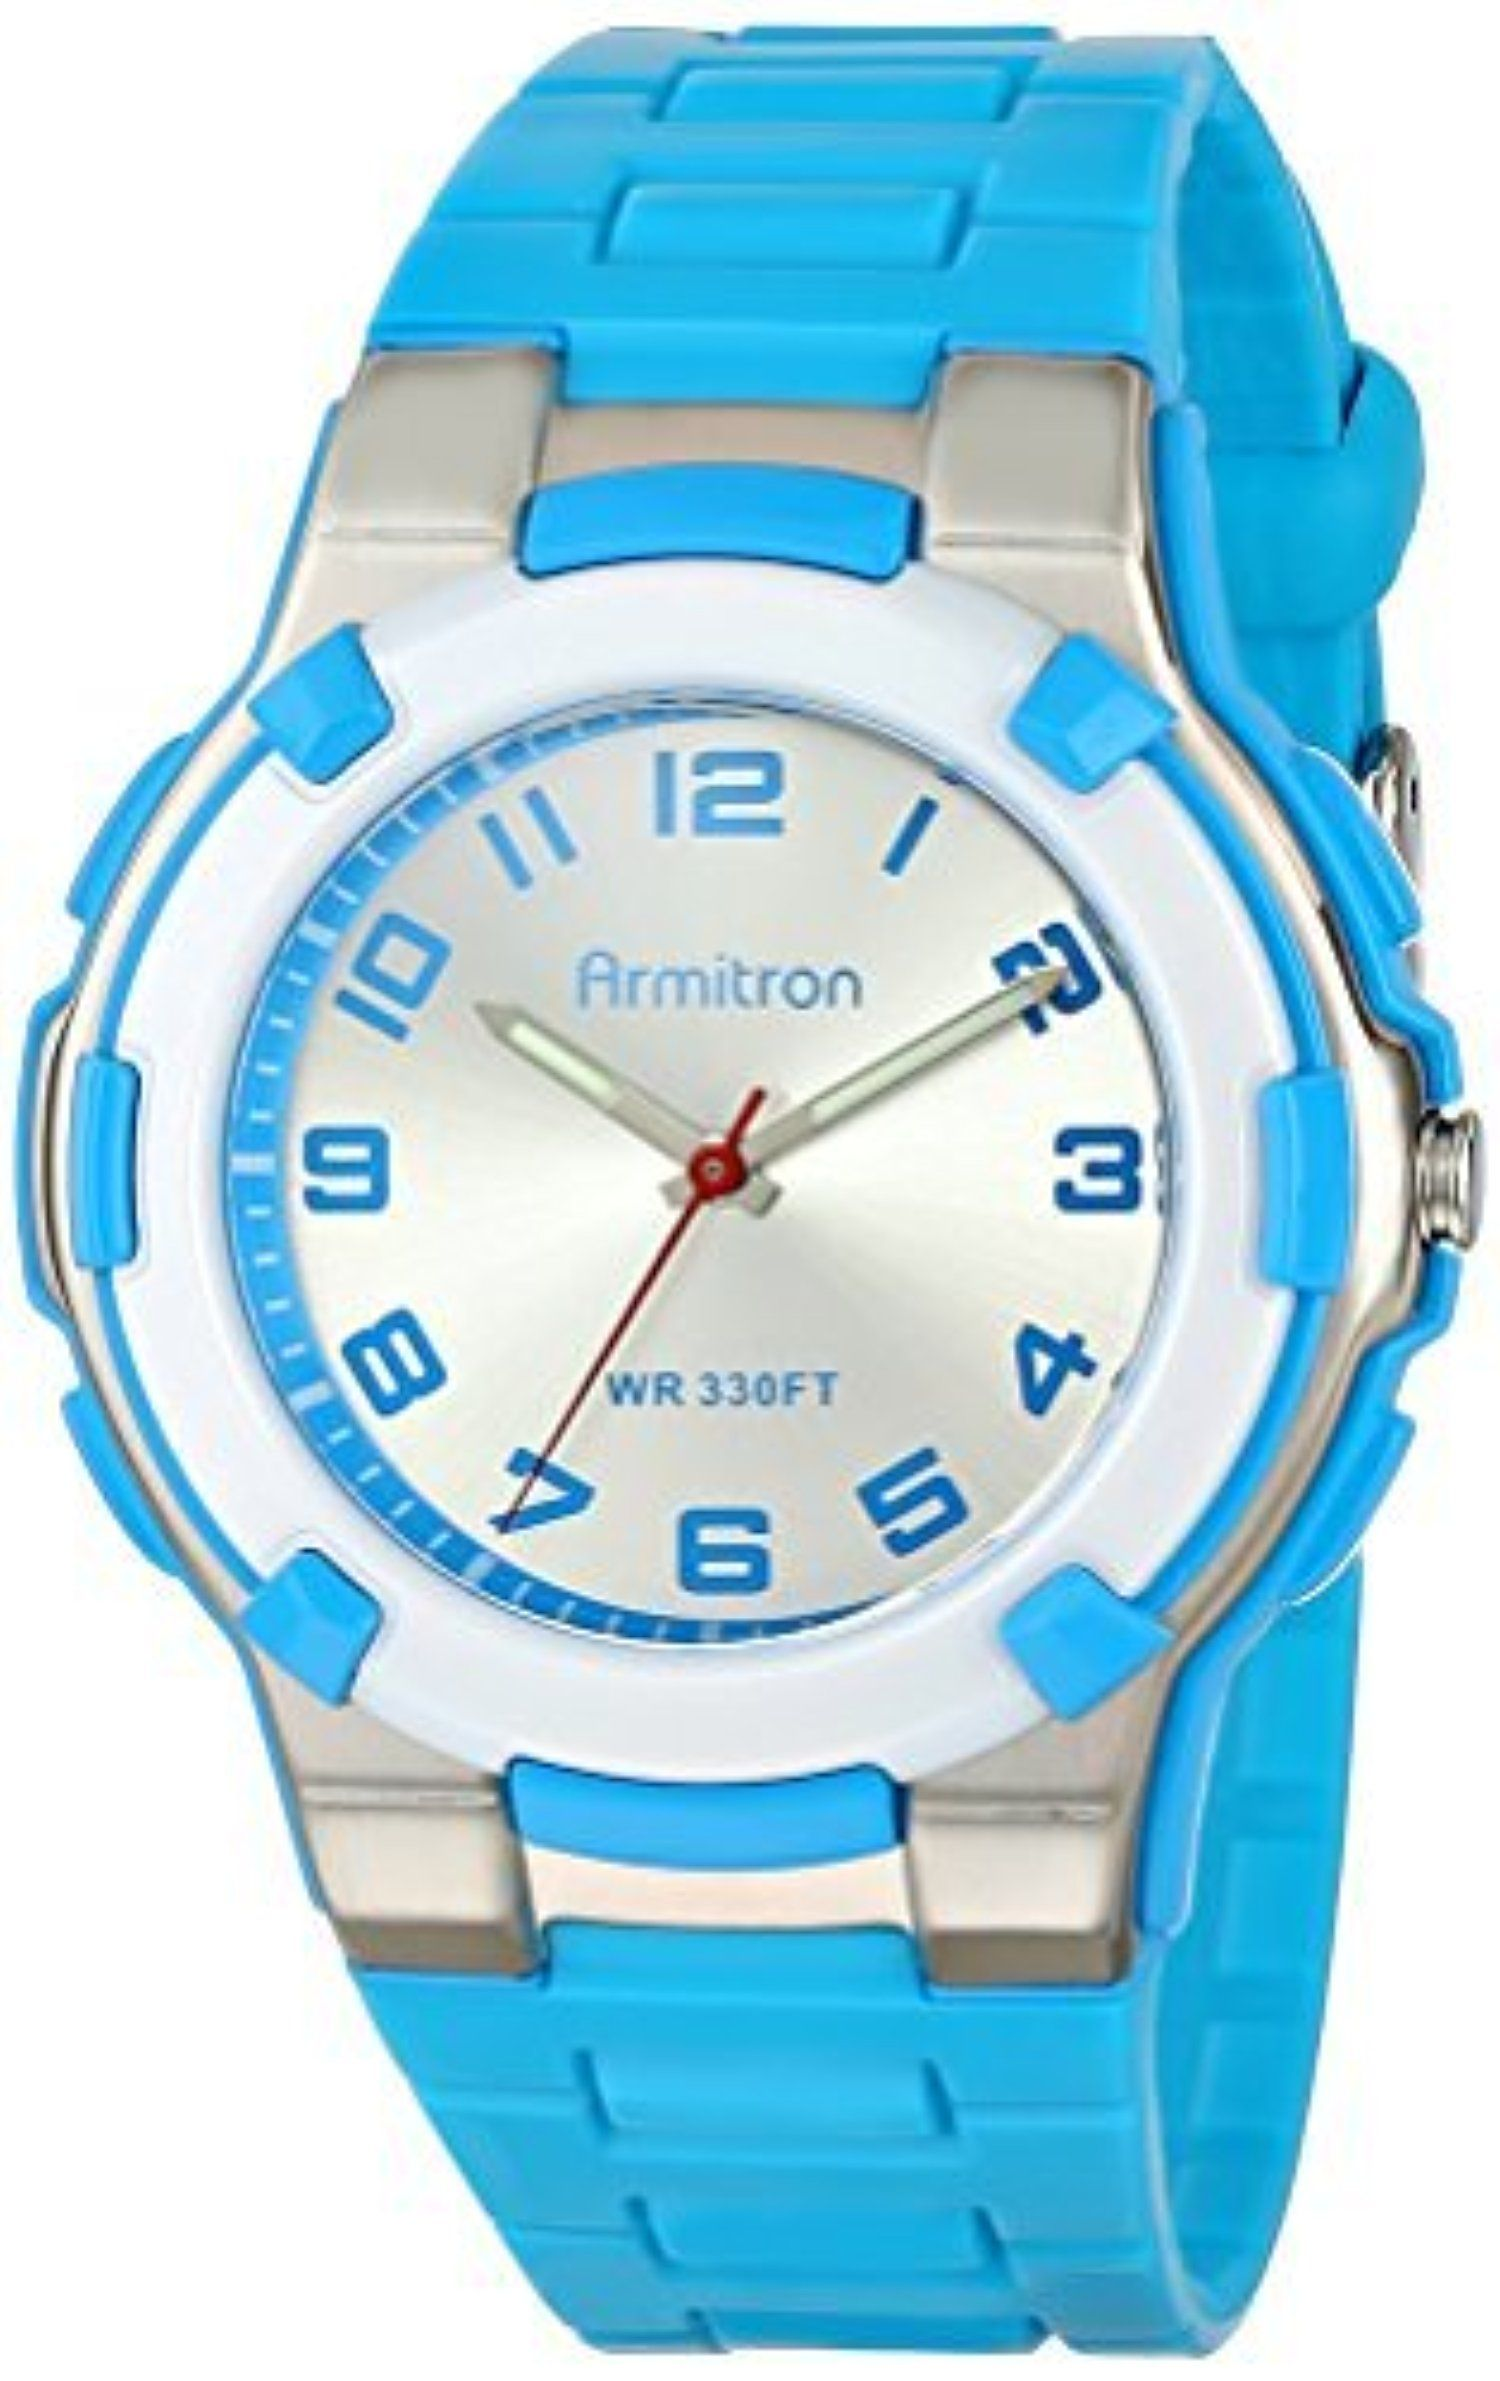 Armitron sport unisex 256420blu easytoread dial